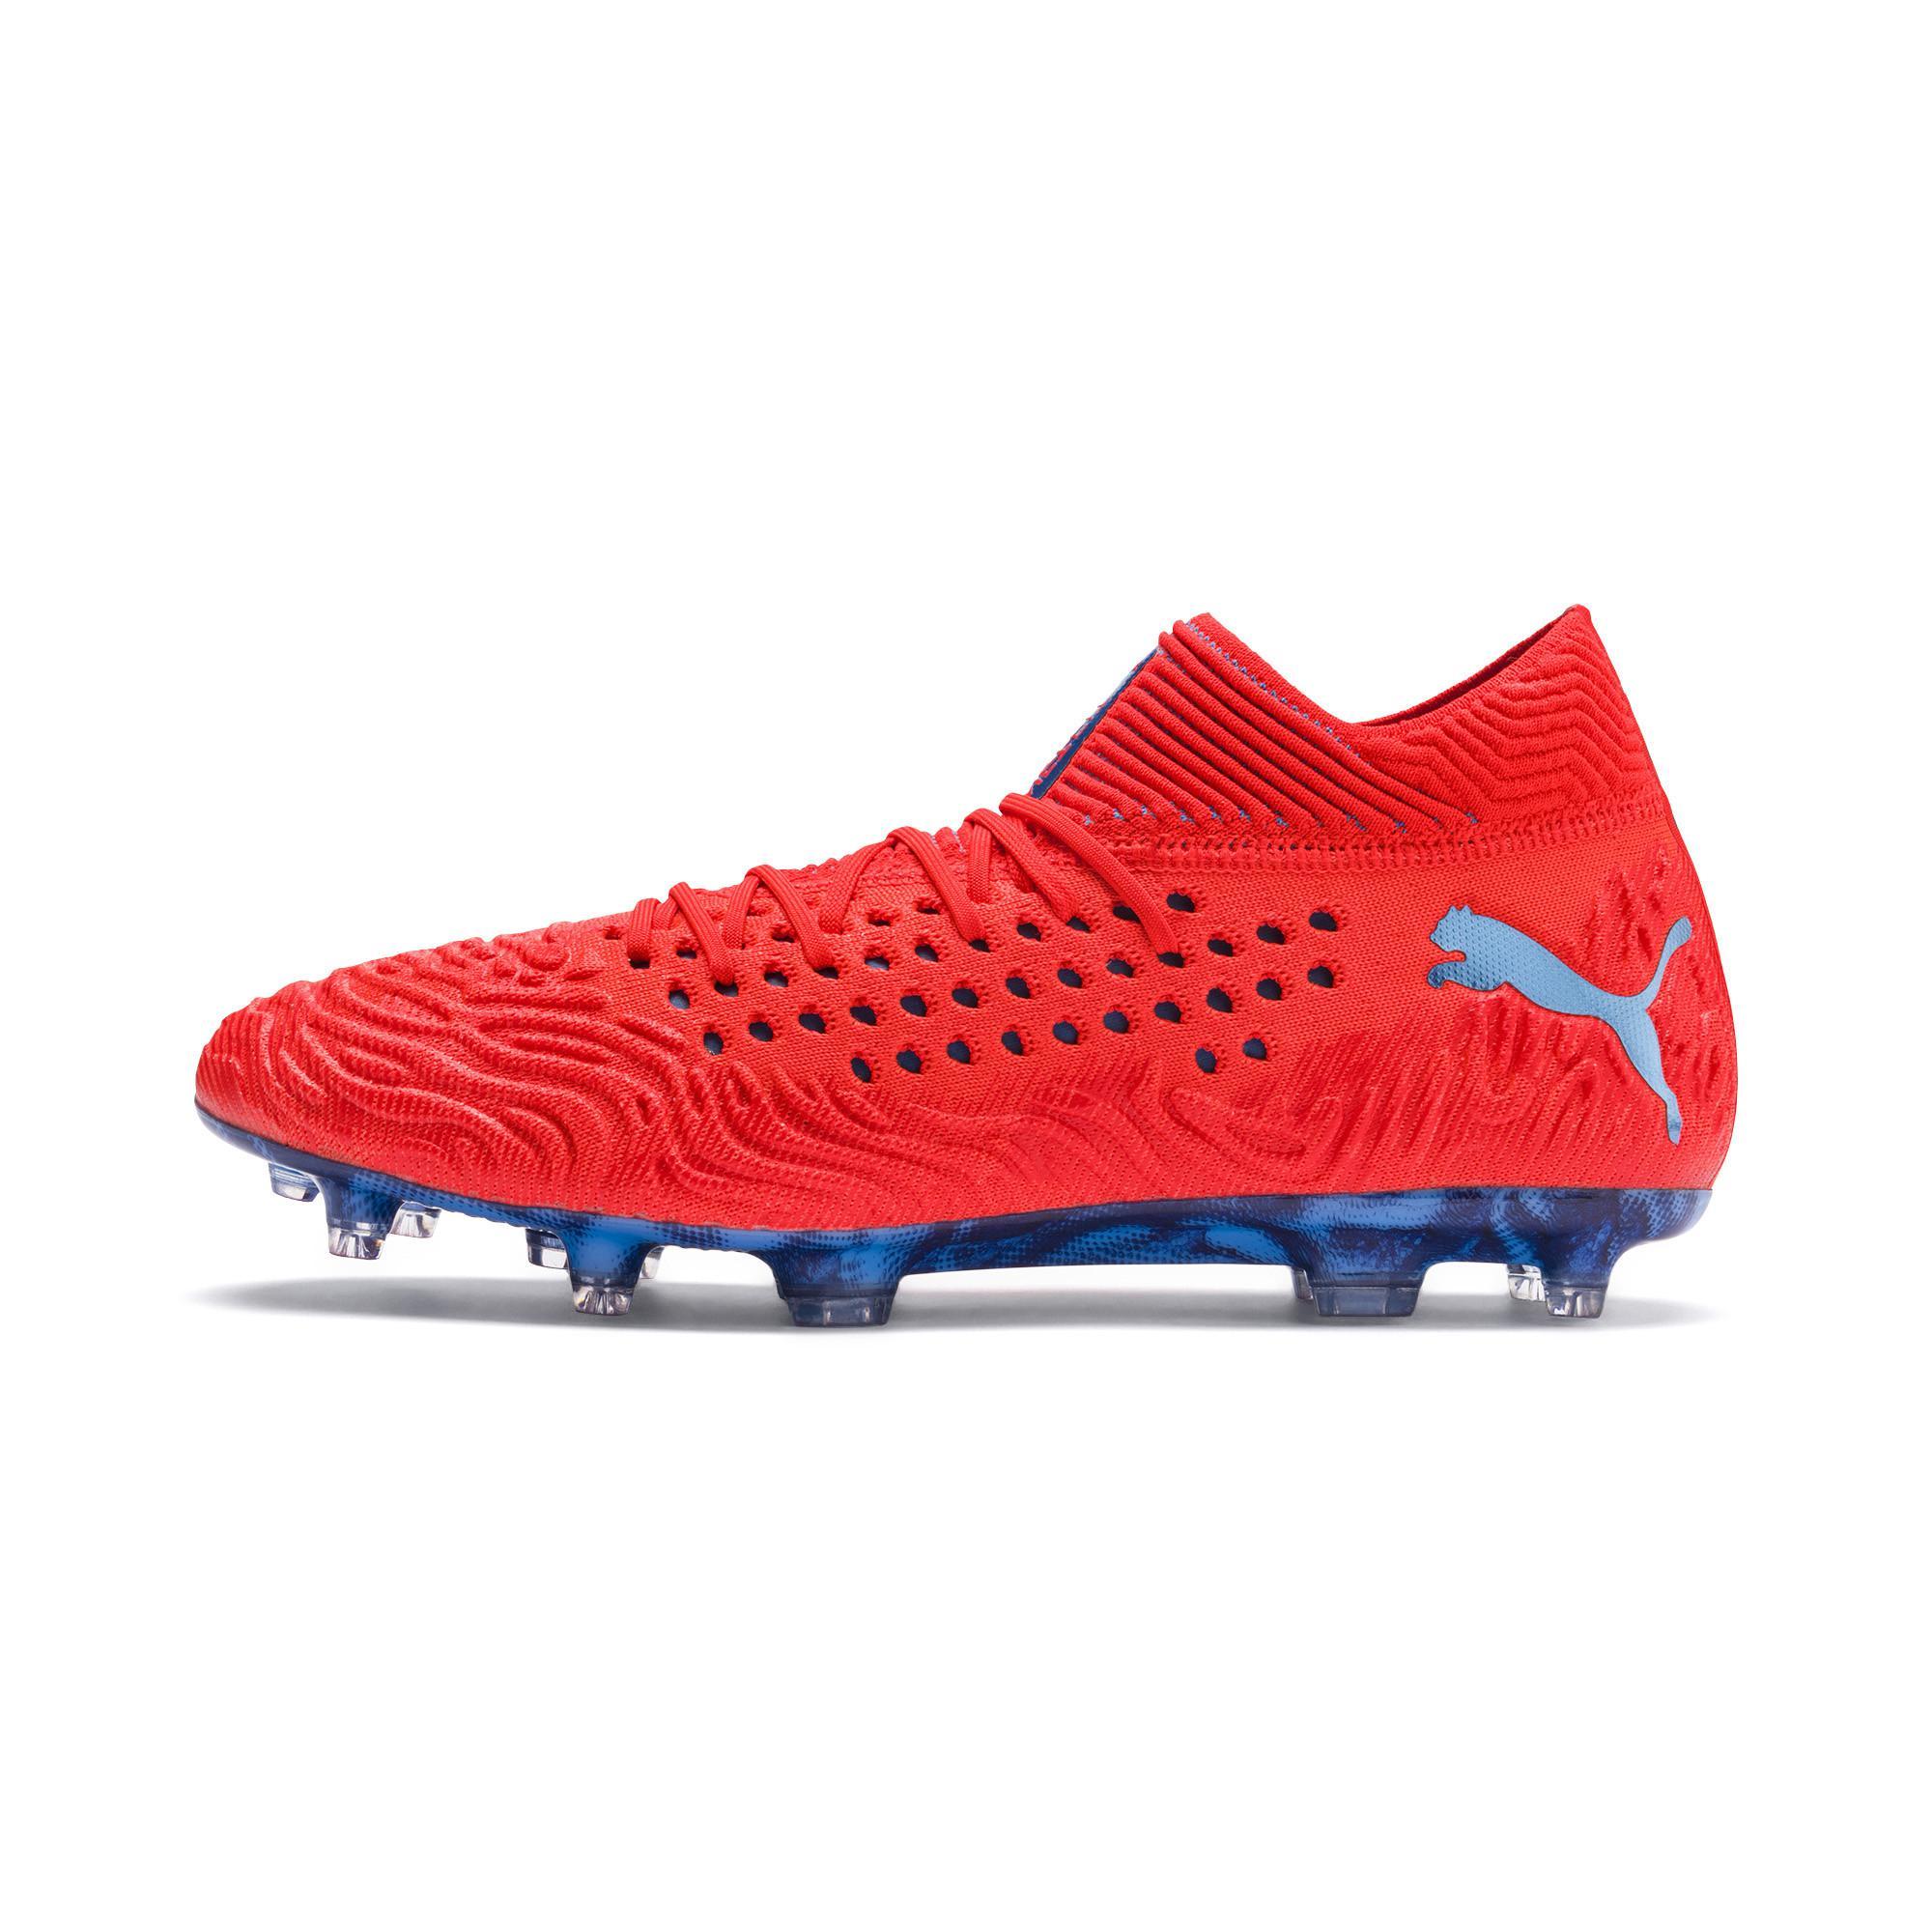 6ac8e9cb27d77d Lyst - PUMA Future 19.1 Netfit Fg ag Men s Soccer Cleats in Red for Men